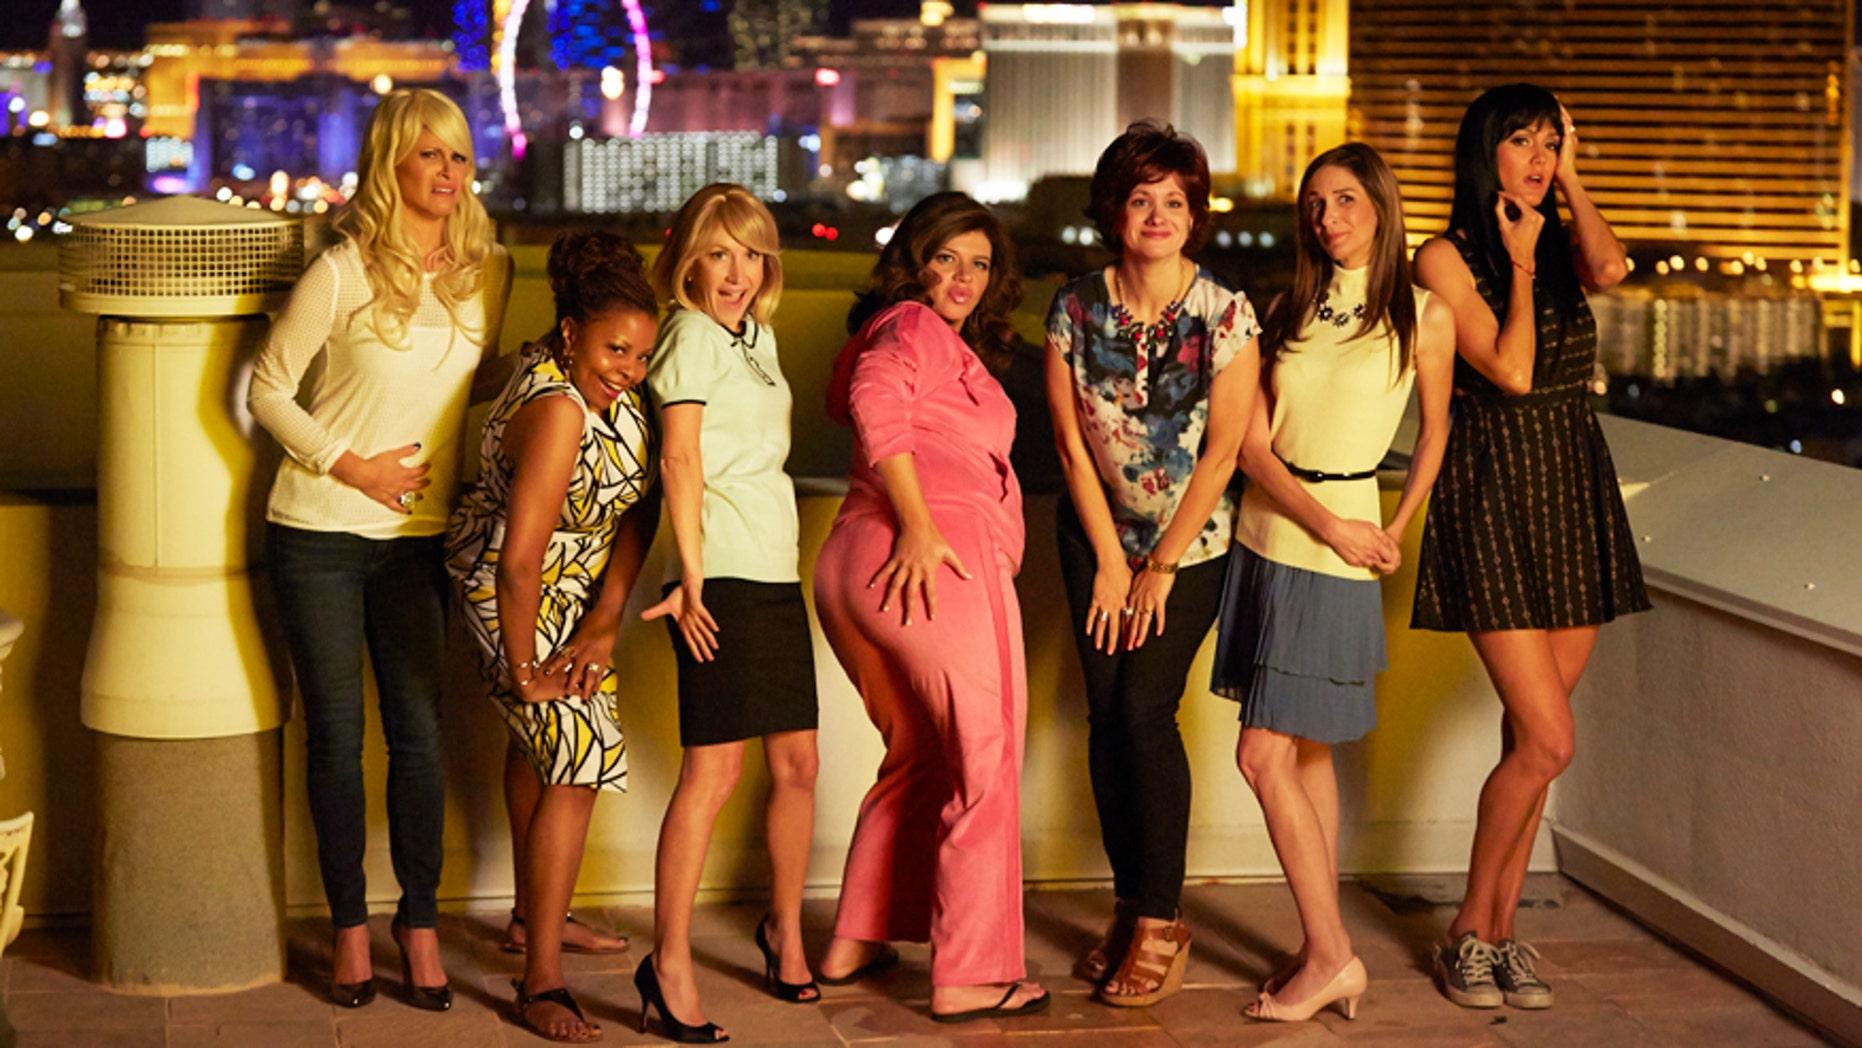 Angela Kinsey, Dannah Phirman, Tymberlee Hill, Andrea Savage, Erinn Hayes, Danielle Schneider, Casey Wilson